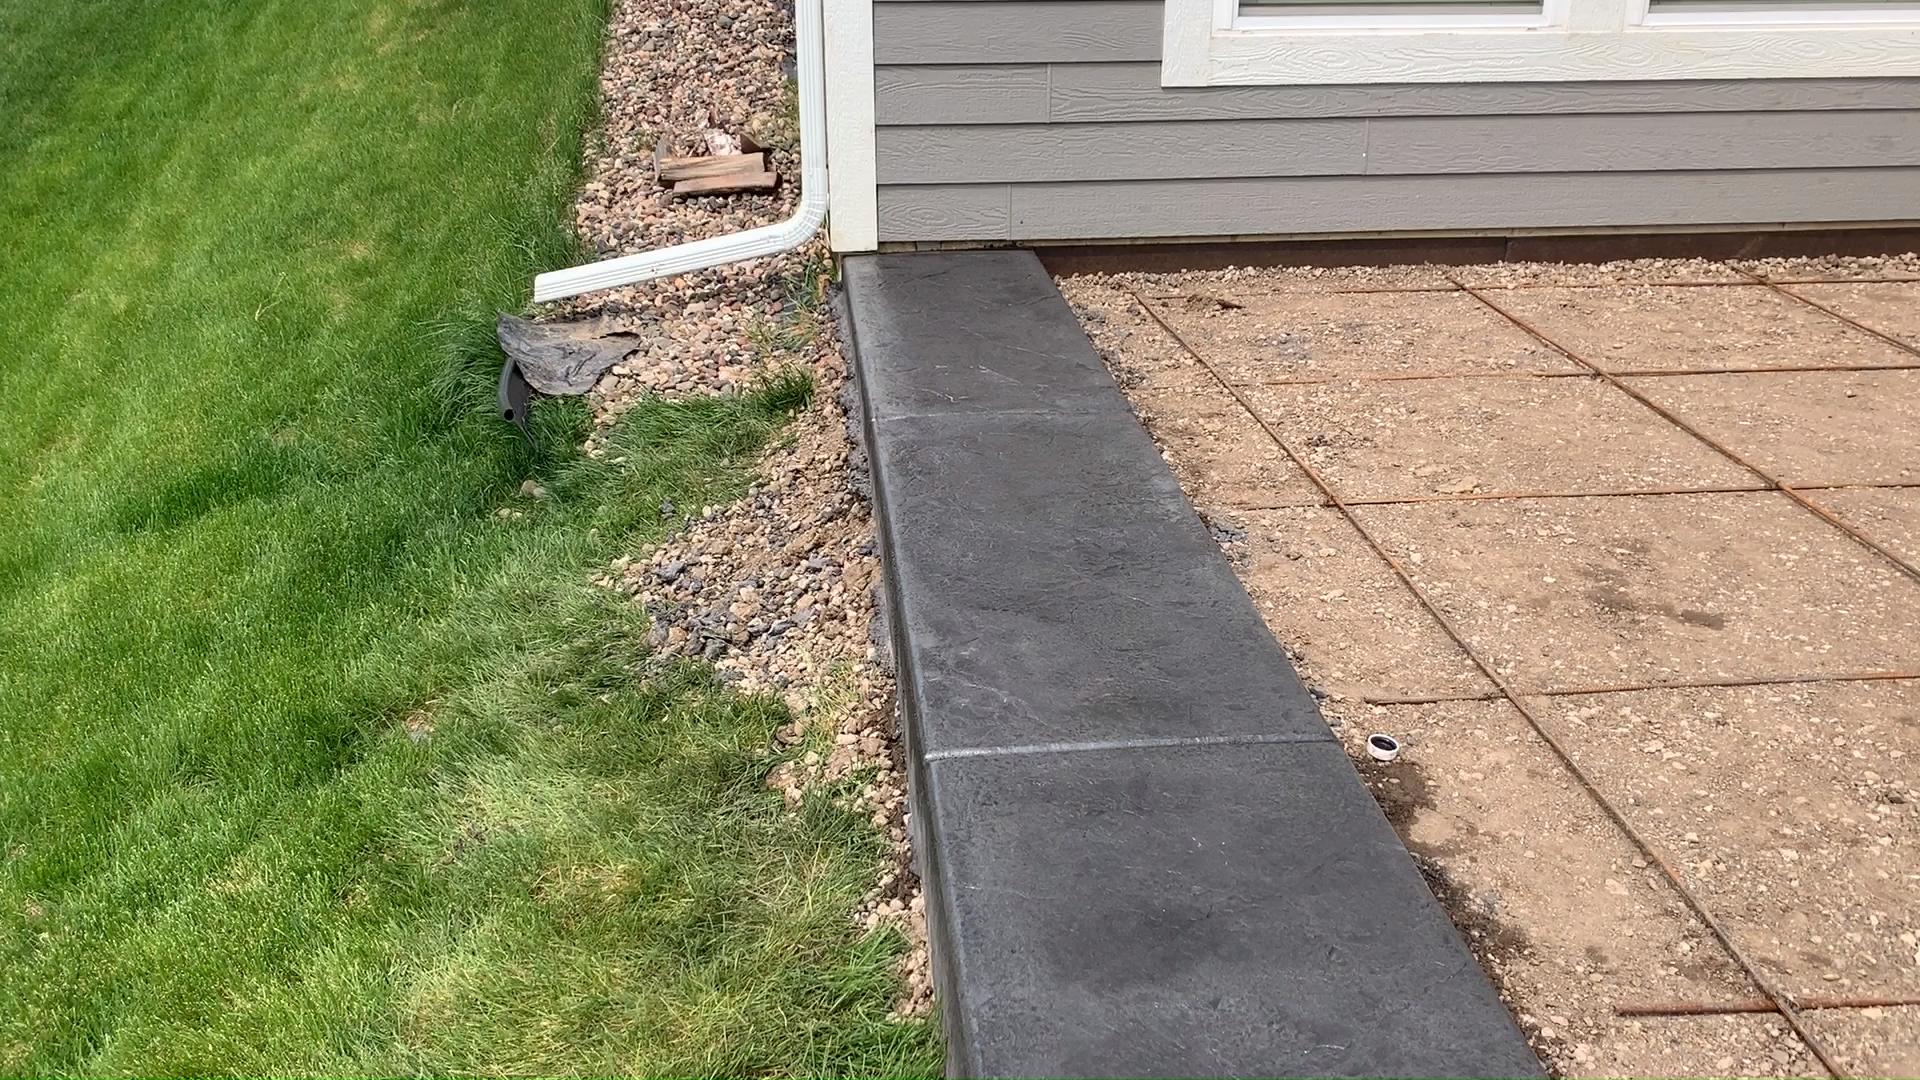 Lakeville Minnesota And Area Video Decorative Concrete Patio Concrete Patio Designs Patio Edging